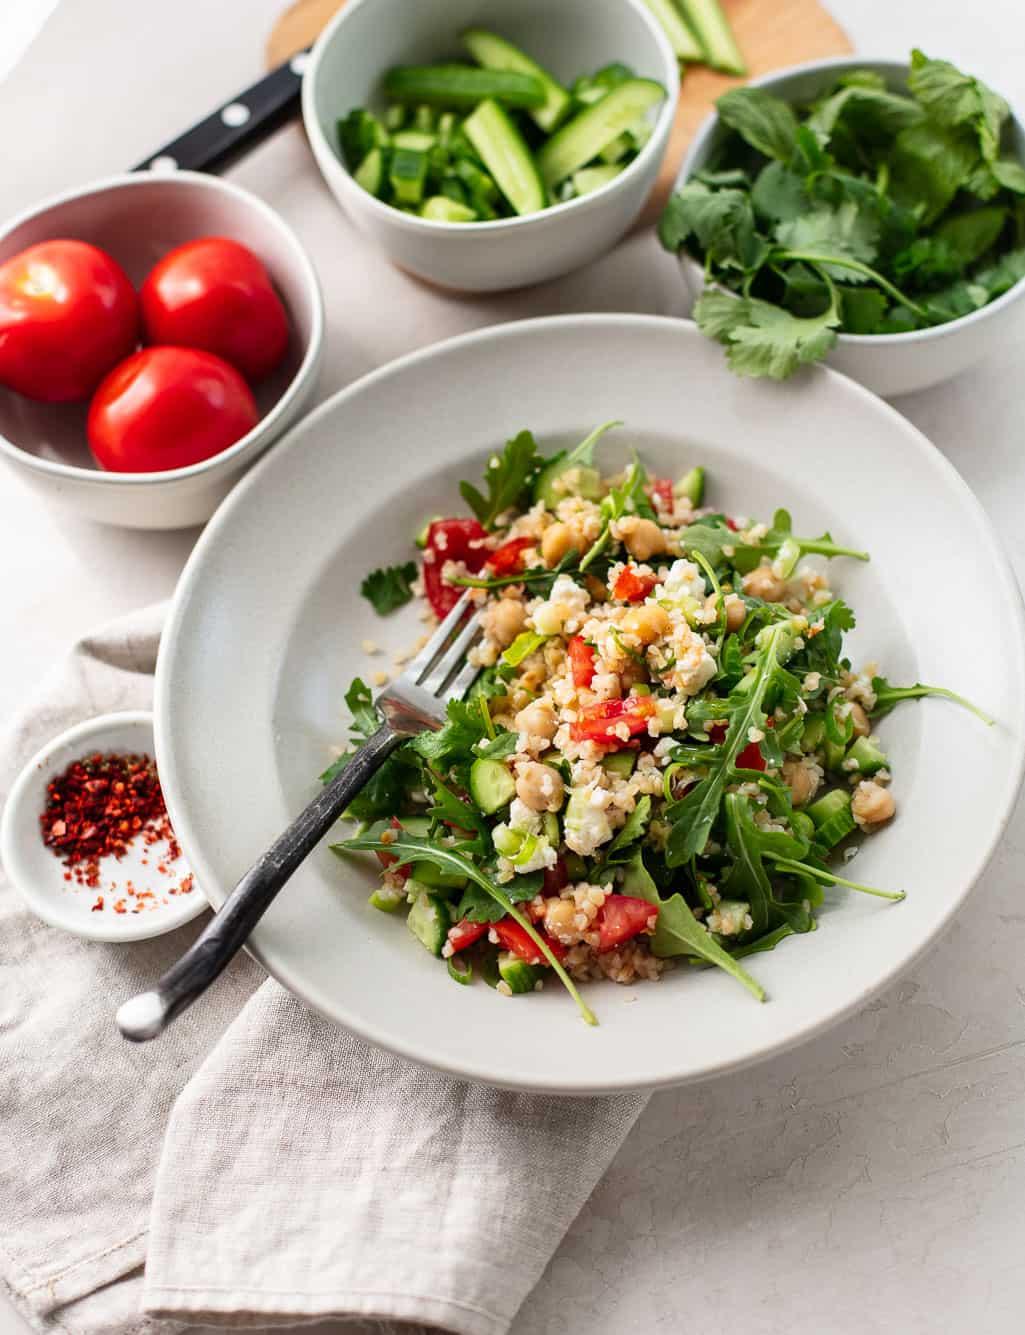 Healthy Refrigerator Tabbouli Salad